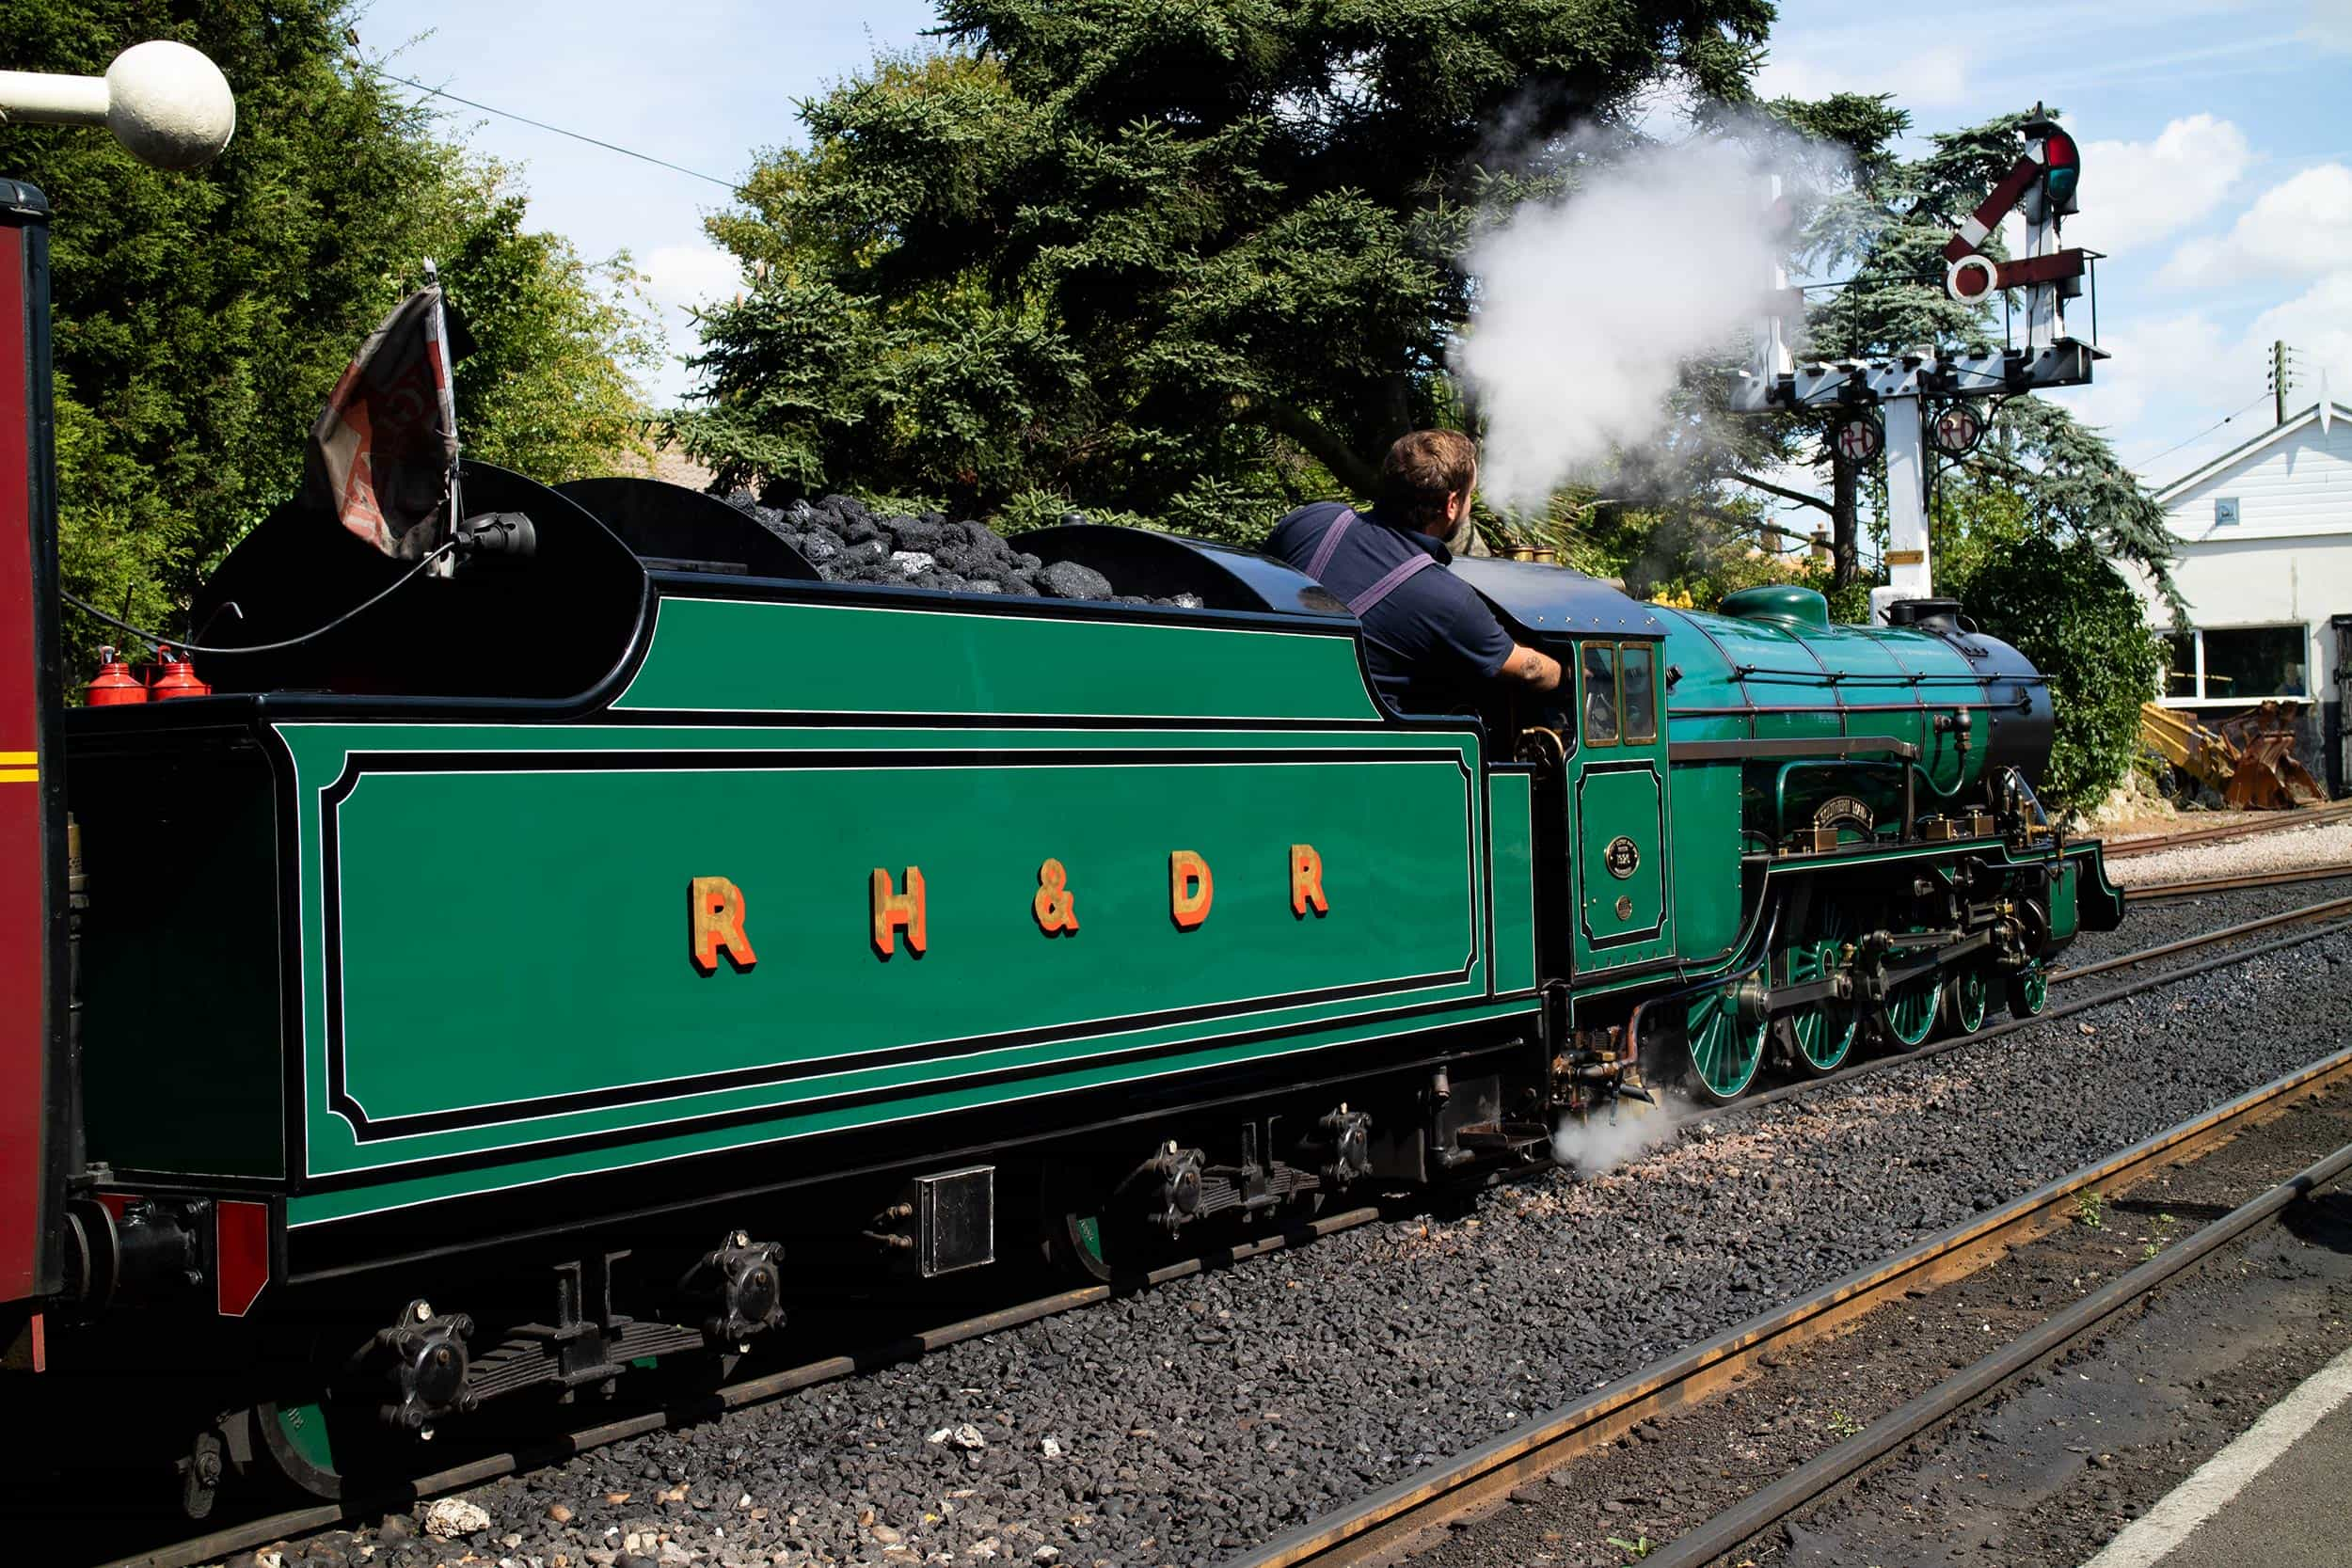 Southern Maid - Romney, Hythe & Dymchurch Railway